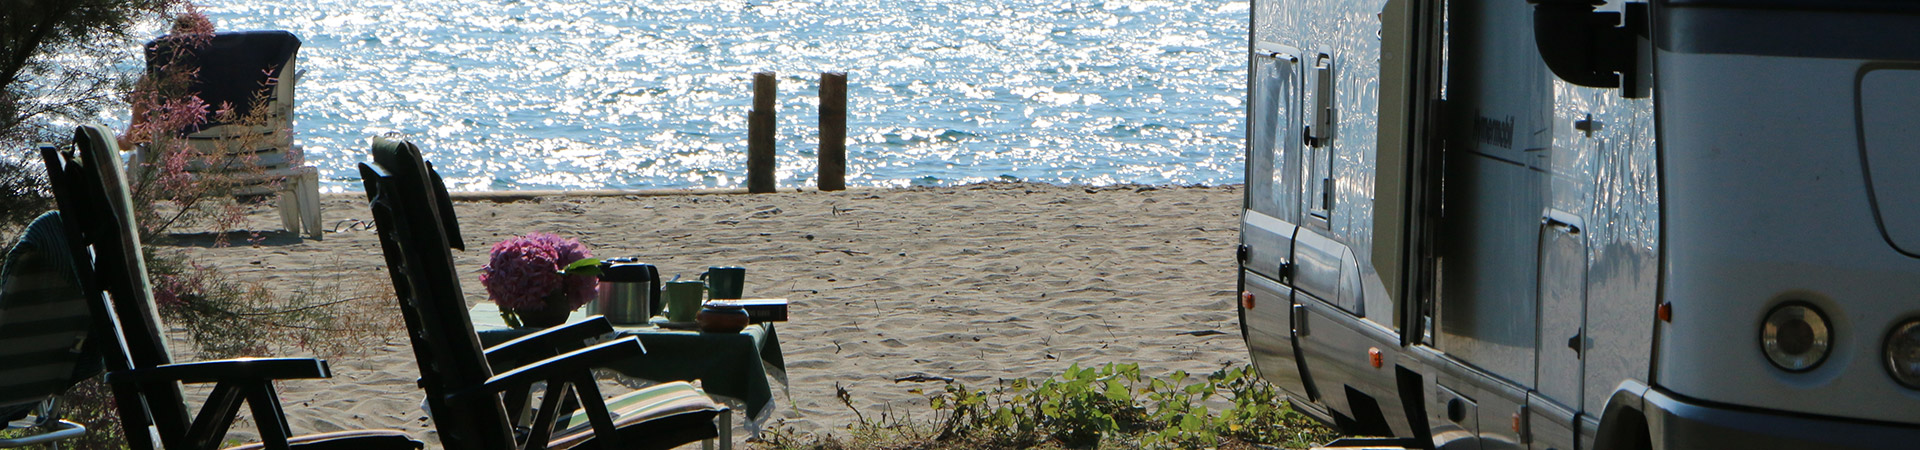 emplacement-bord-de-mer-camping-merendella